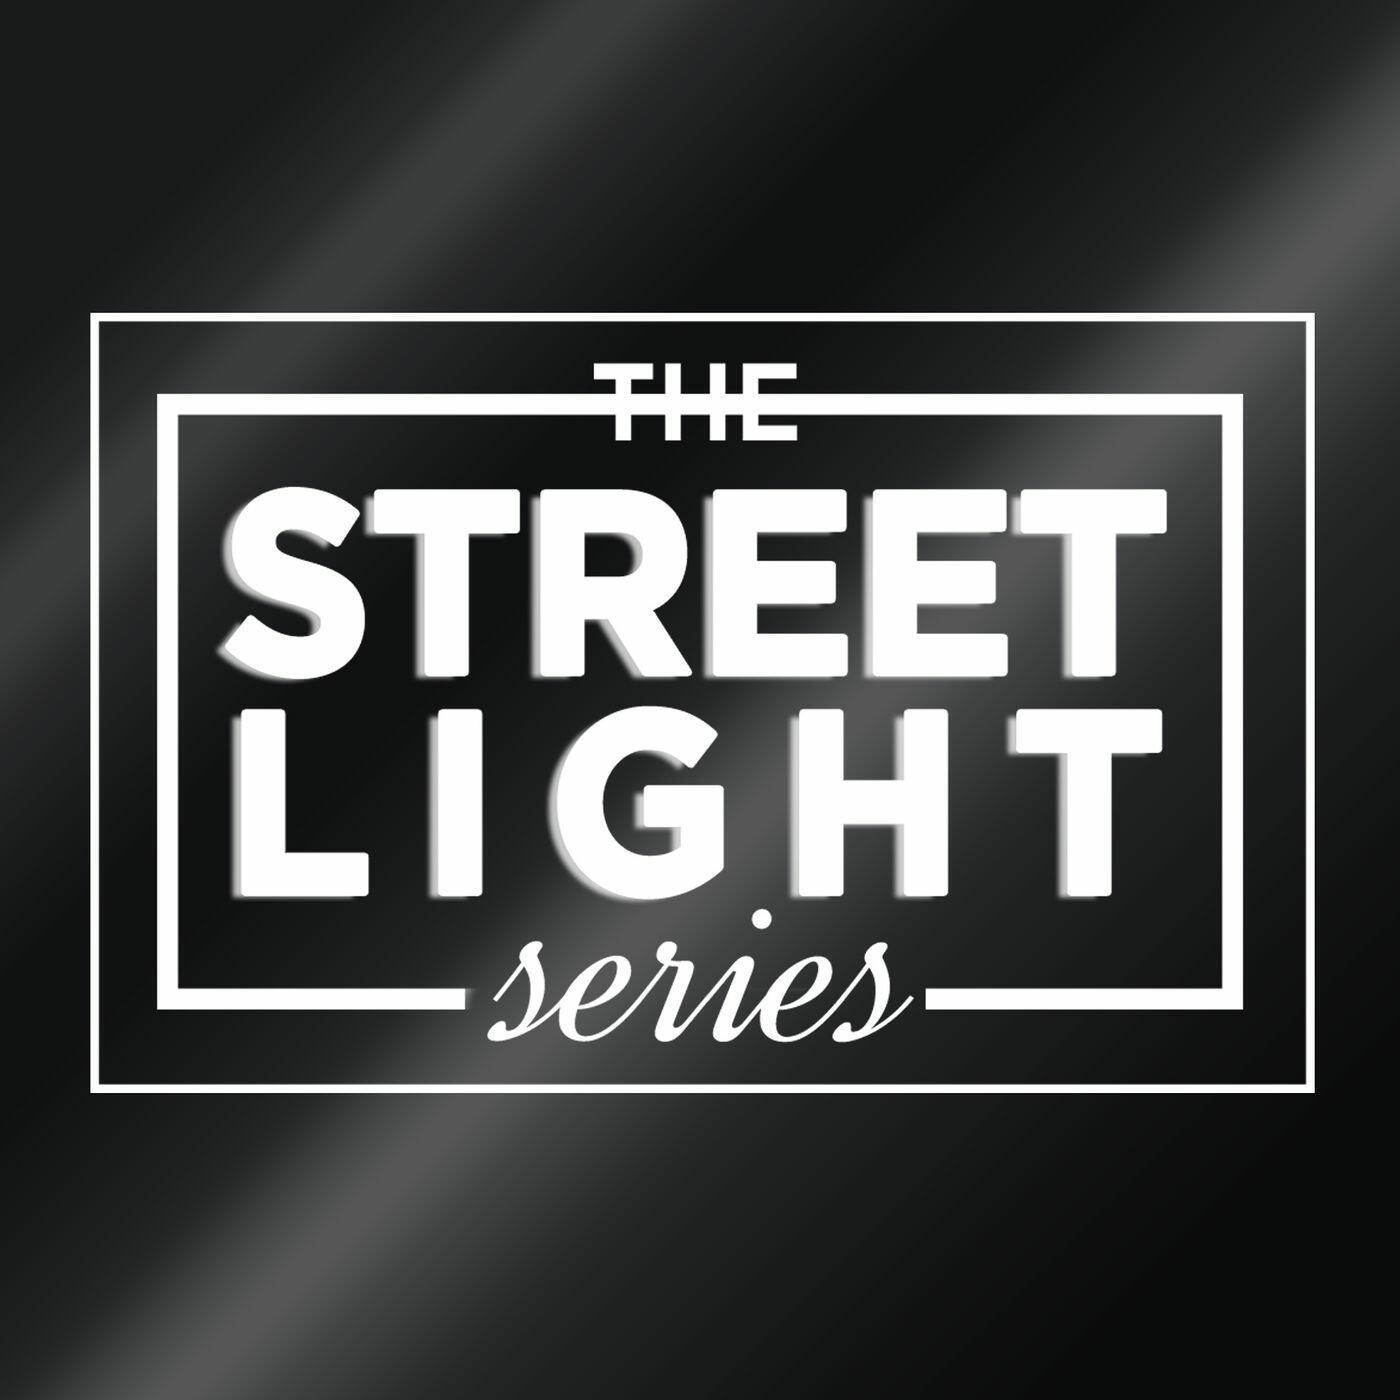 The Street Light Series